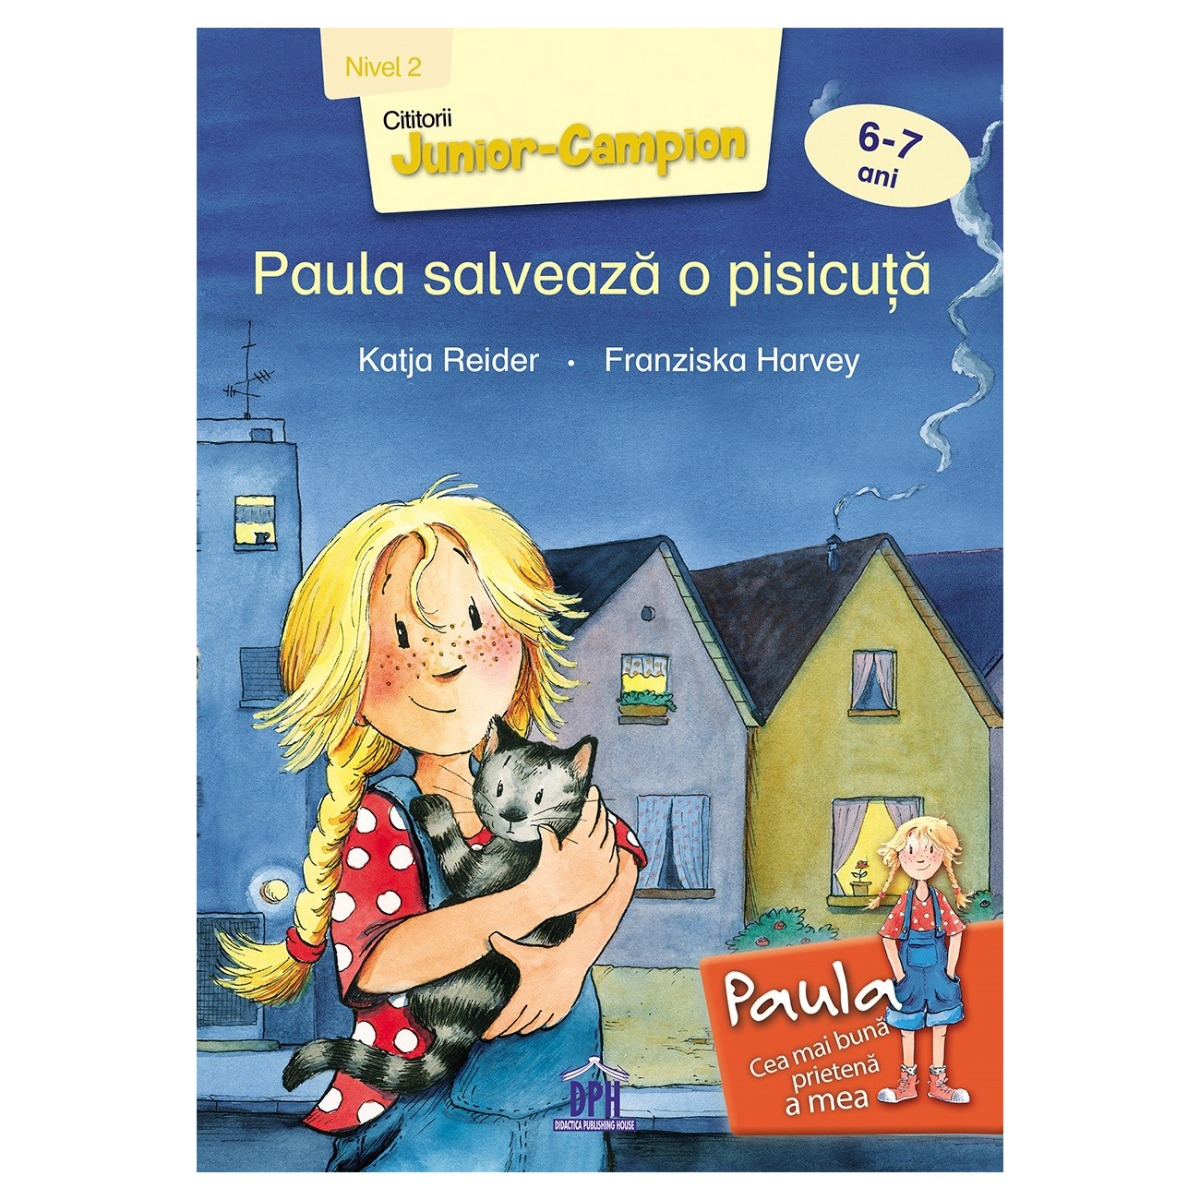 Carte Paula salveaza o pisicuta - nivel 2, Editura DPH